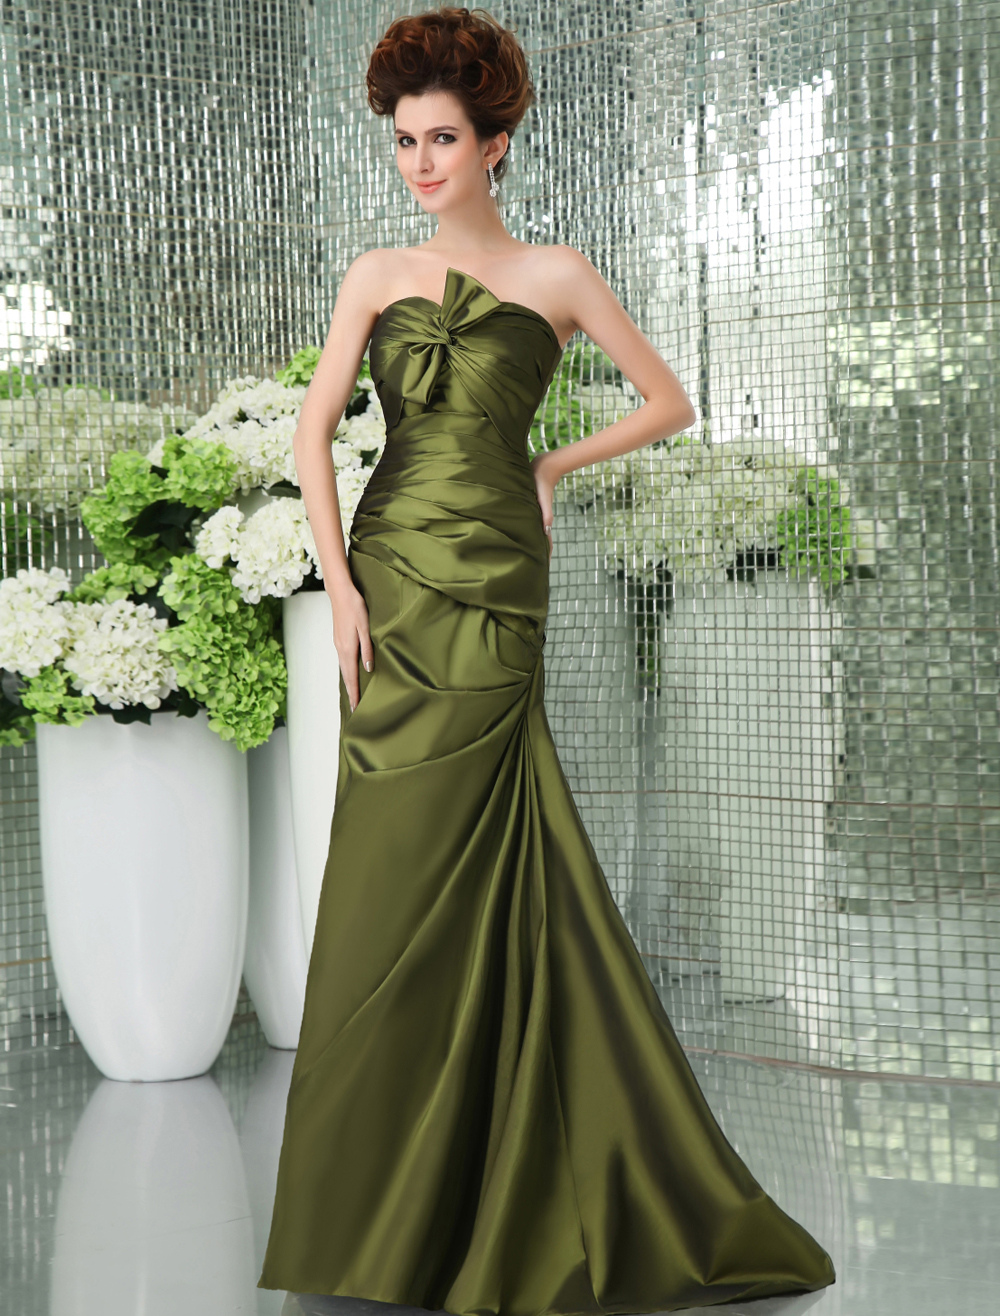 Green Strapless Sweep Taffeta Prom Dress (Wedding Prom Dresses) photo